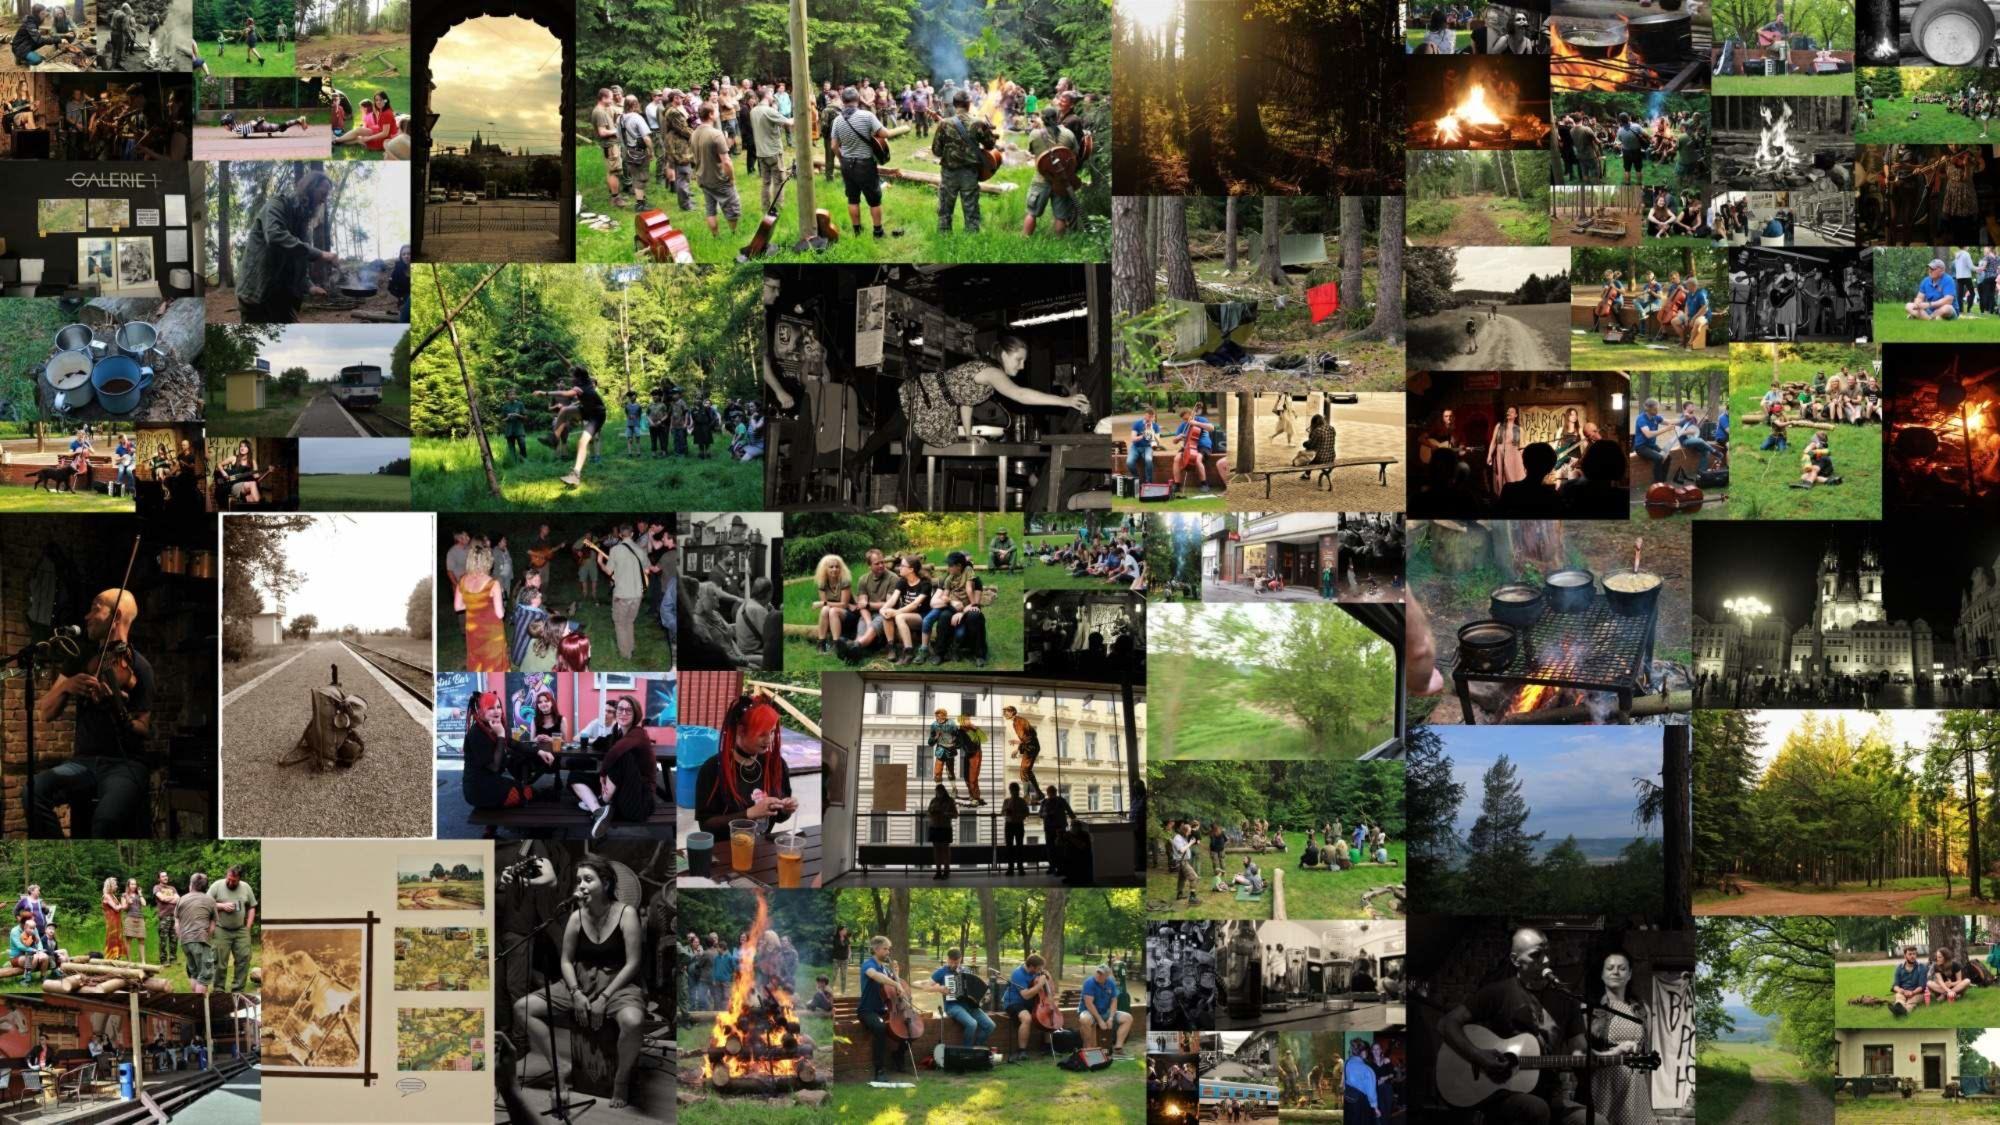 rajce.idnes.cz backyard.rajce.idnes.cz 10 2013-01-12 Léto 2012 H.T – tlumenak – album na Rajčeti